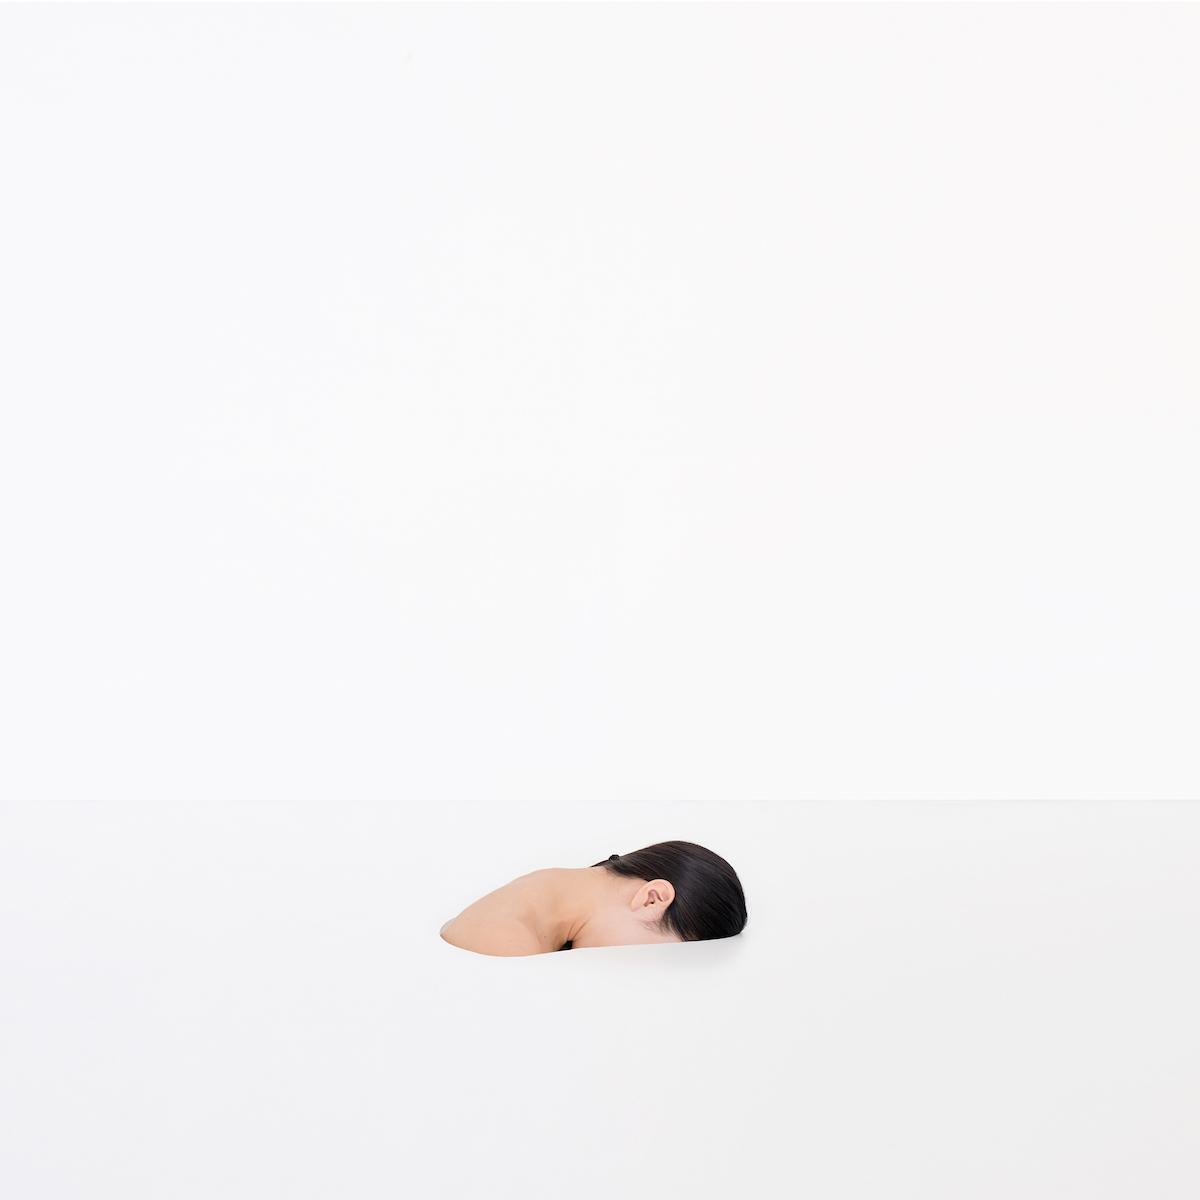 Valentina-Loffredo-art-collection